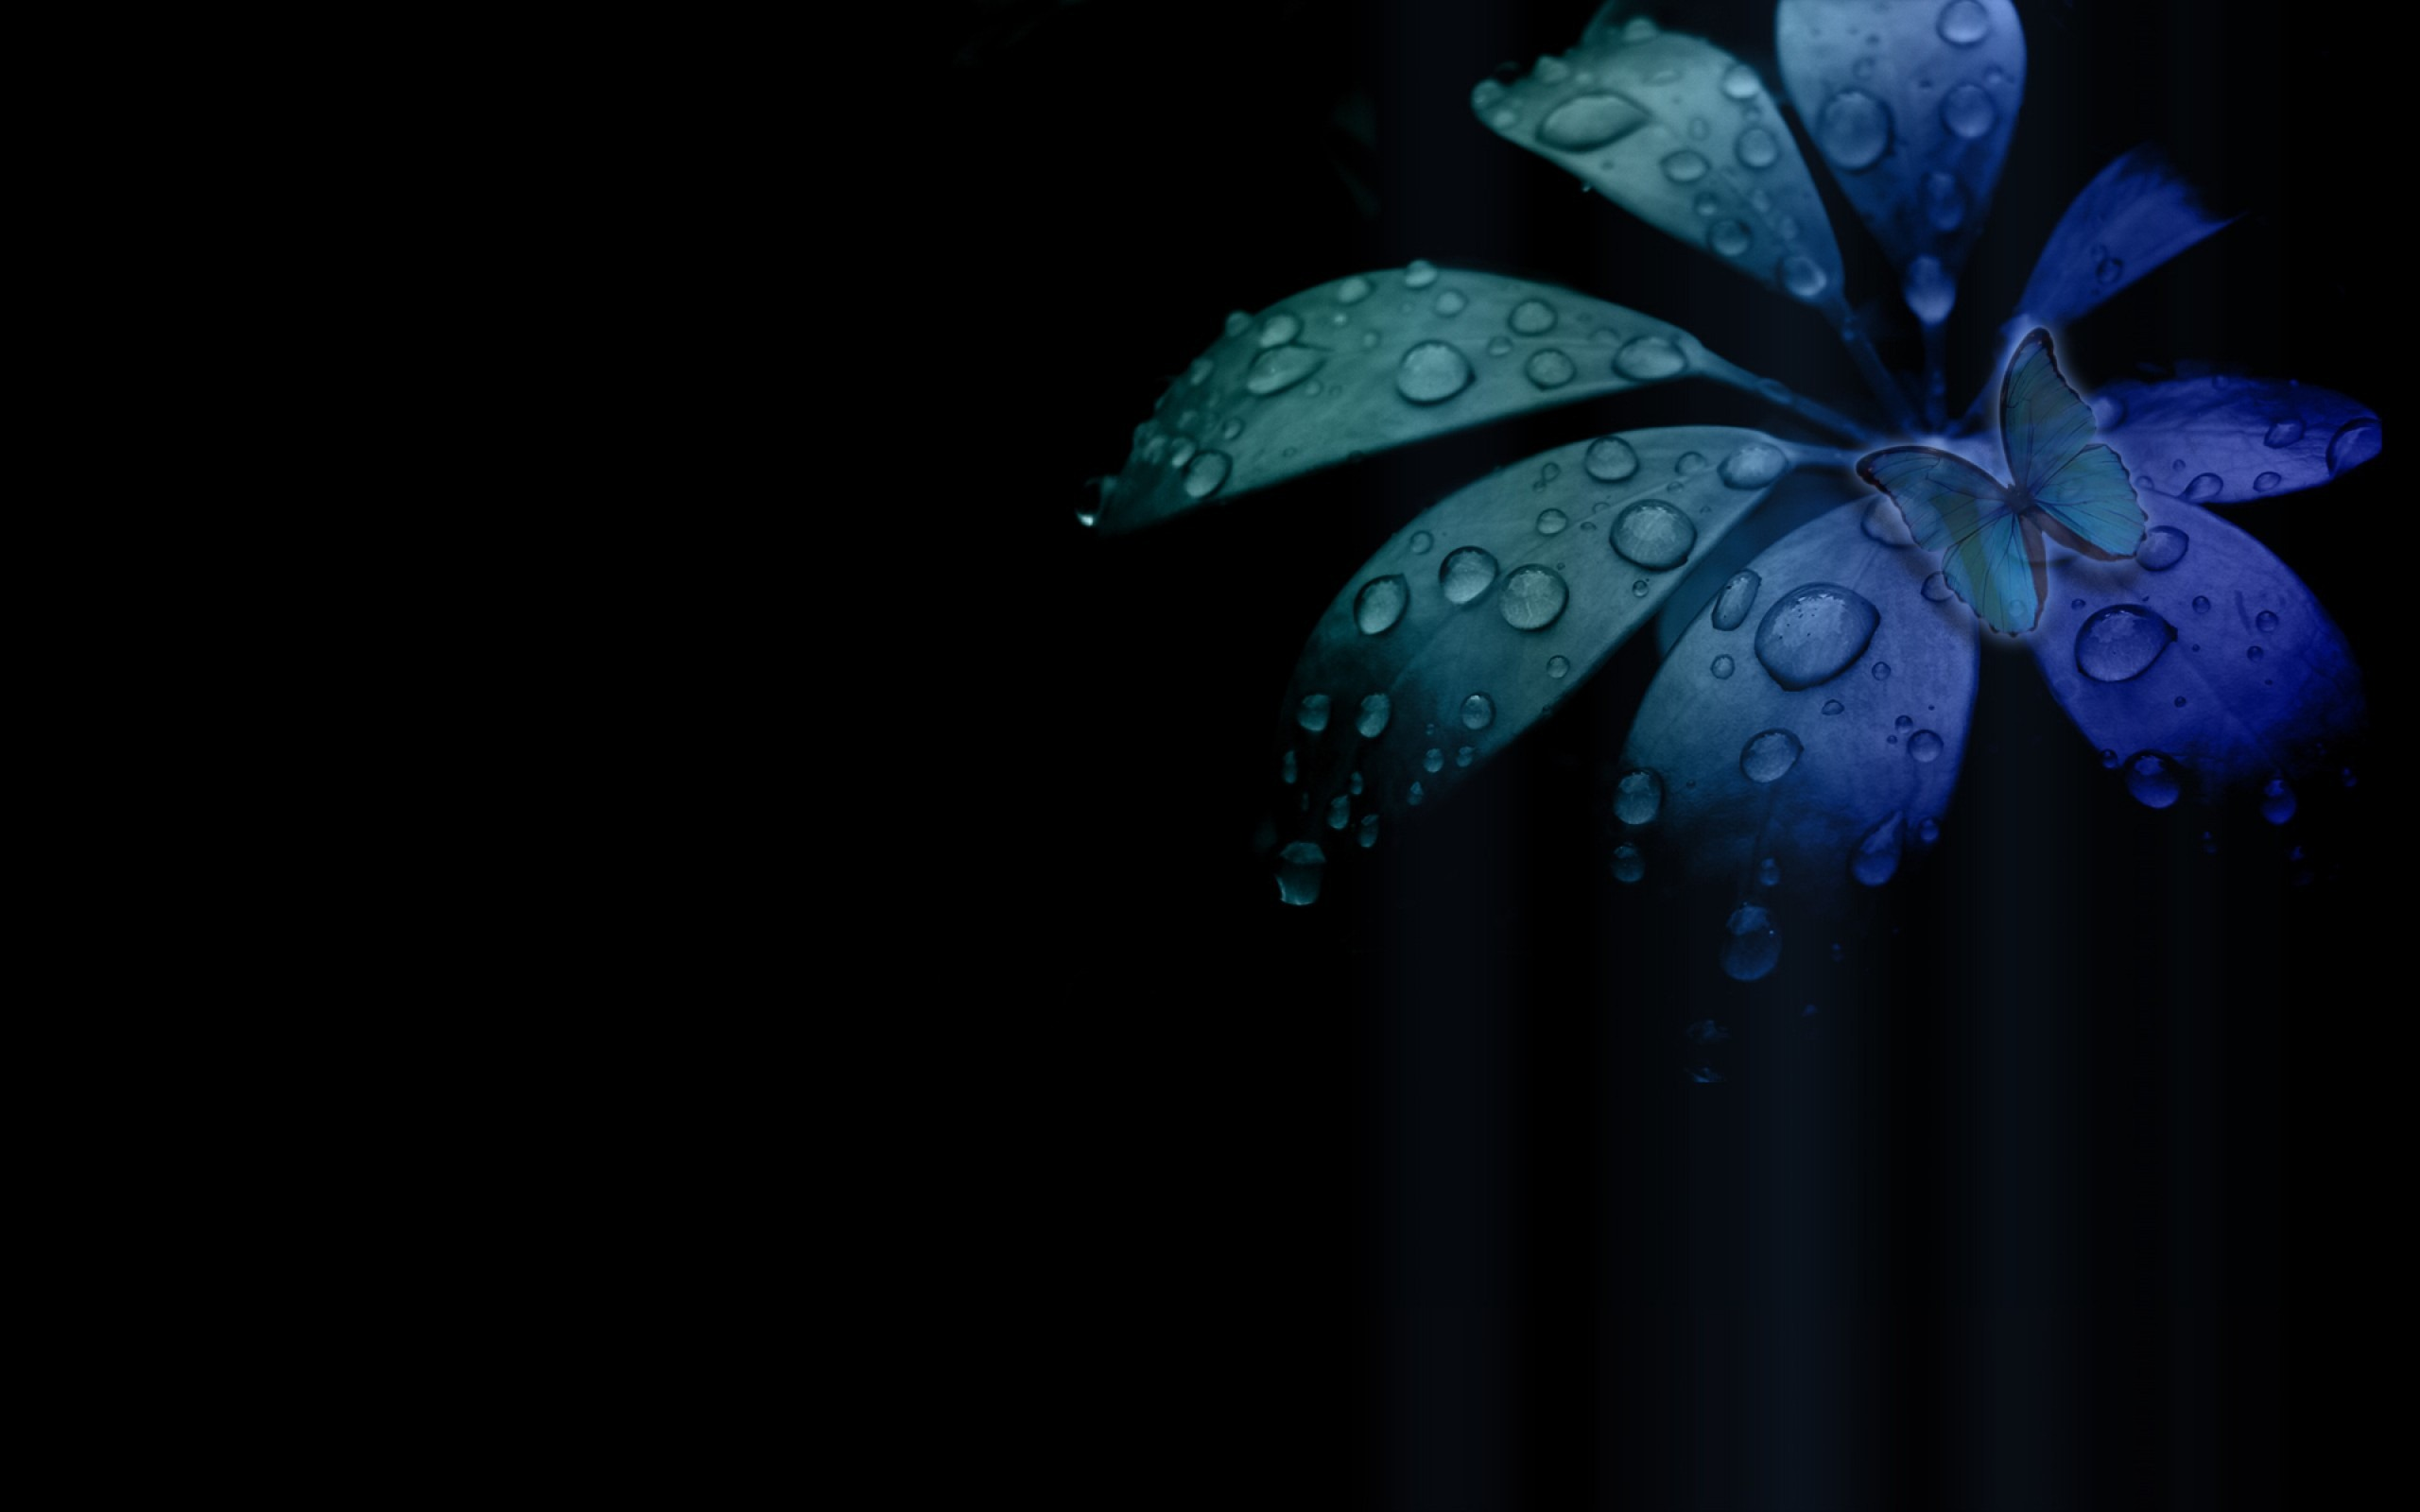 Free Download Black Flower Desktop Wallpaper Hd 3 High Resolution